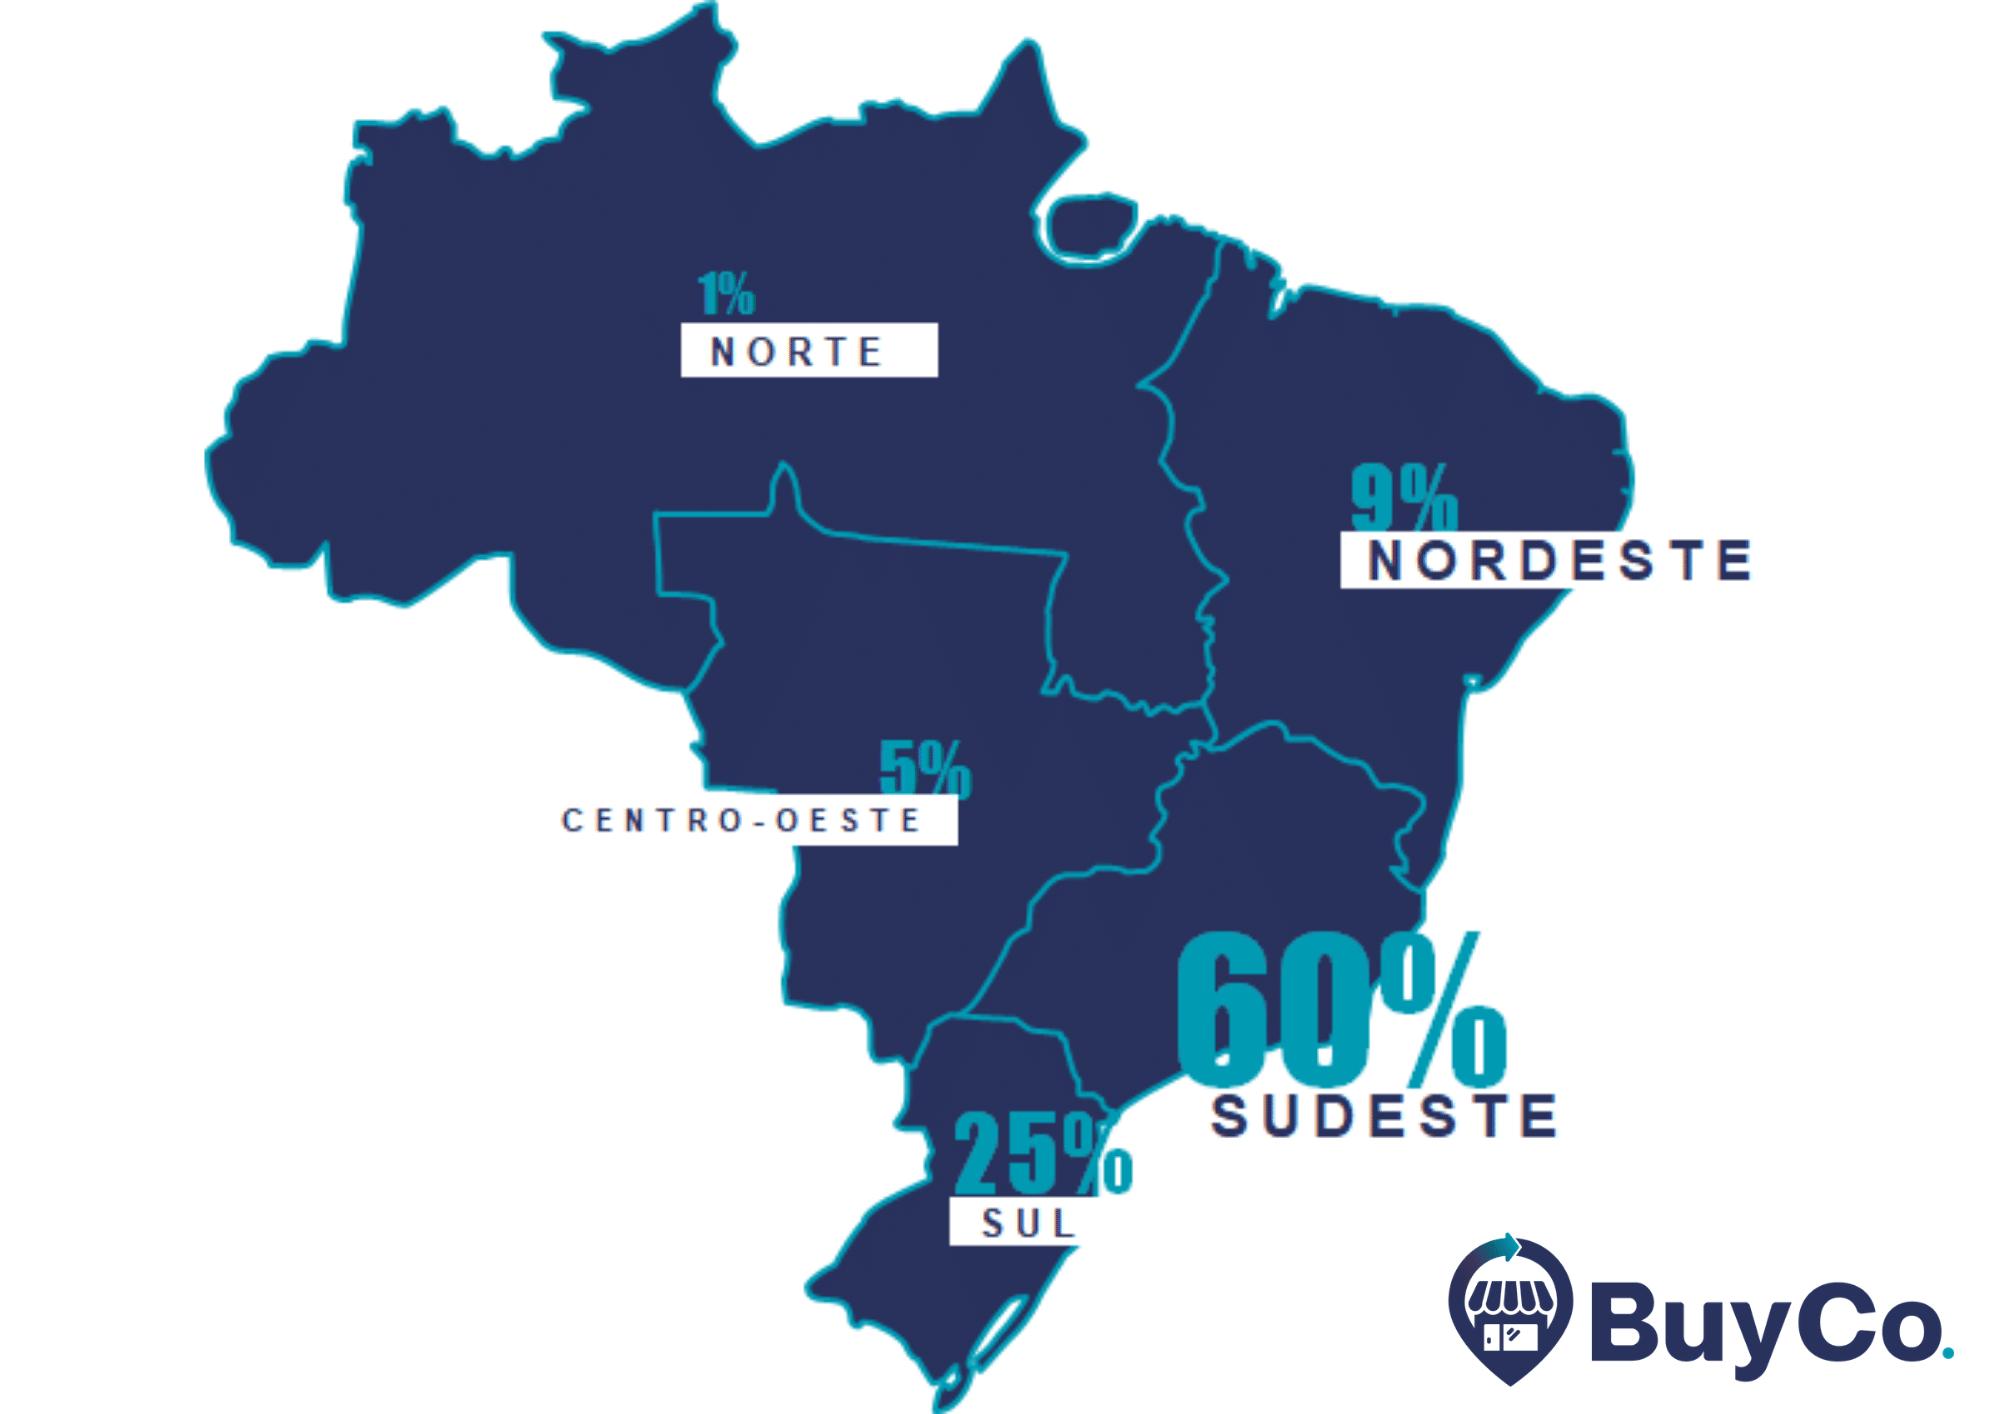 mapa-do-brasil-representando-o-mercado-de-restaurantes-distribuidos-por-regiao